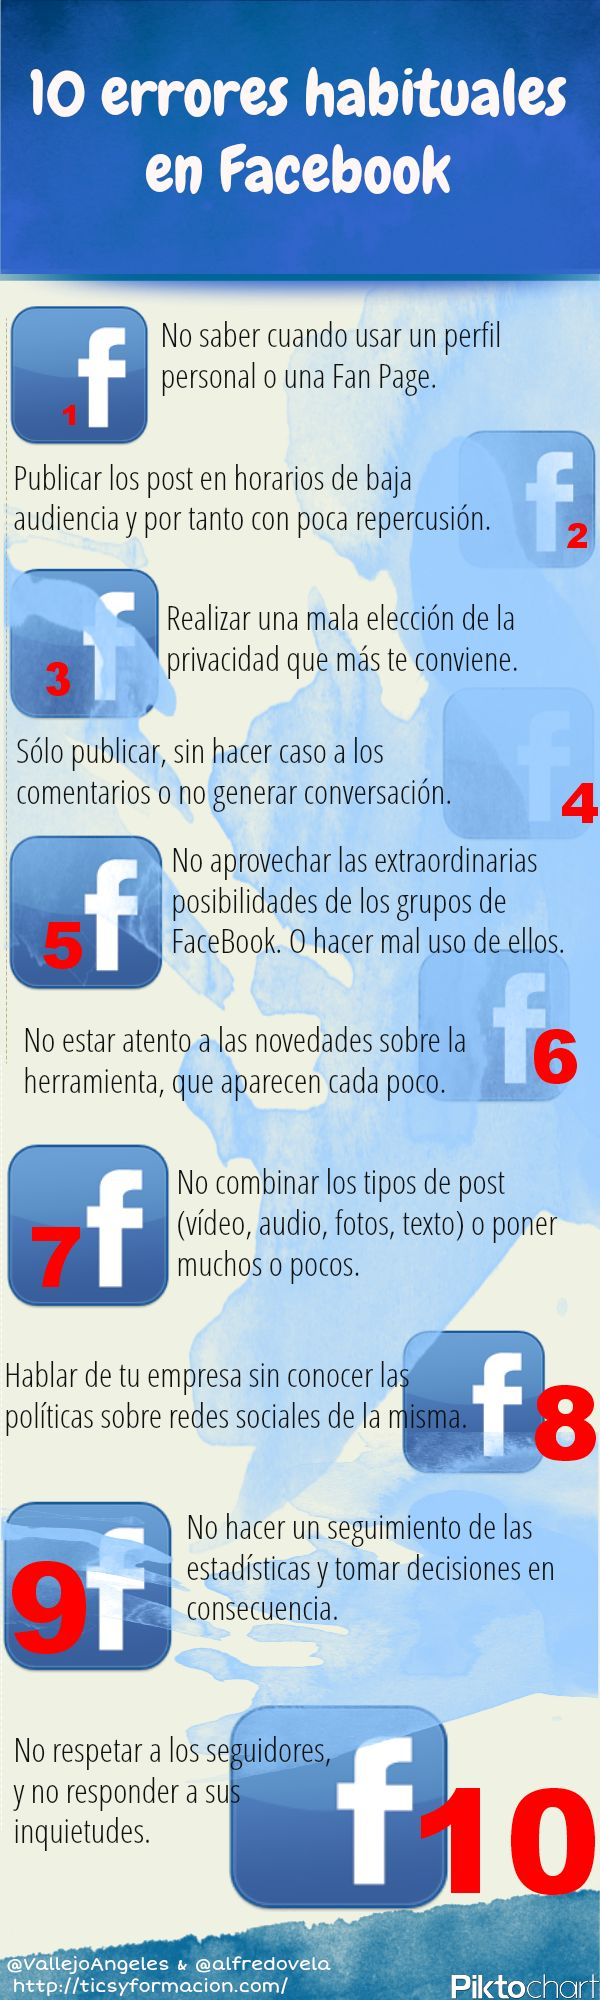 10 errores habituales en FaceBook #infografia #infographic #socialmedia